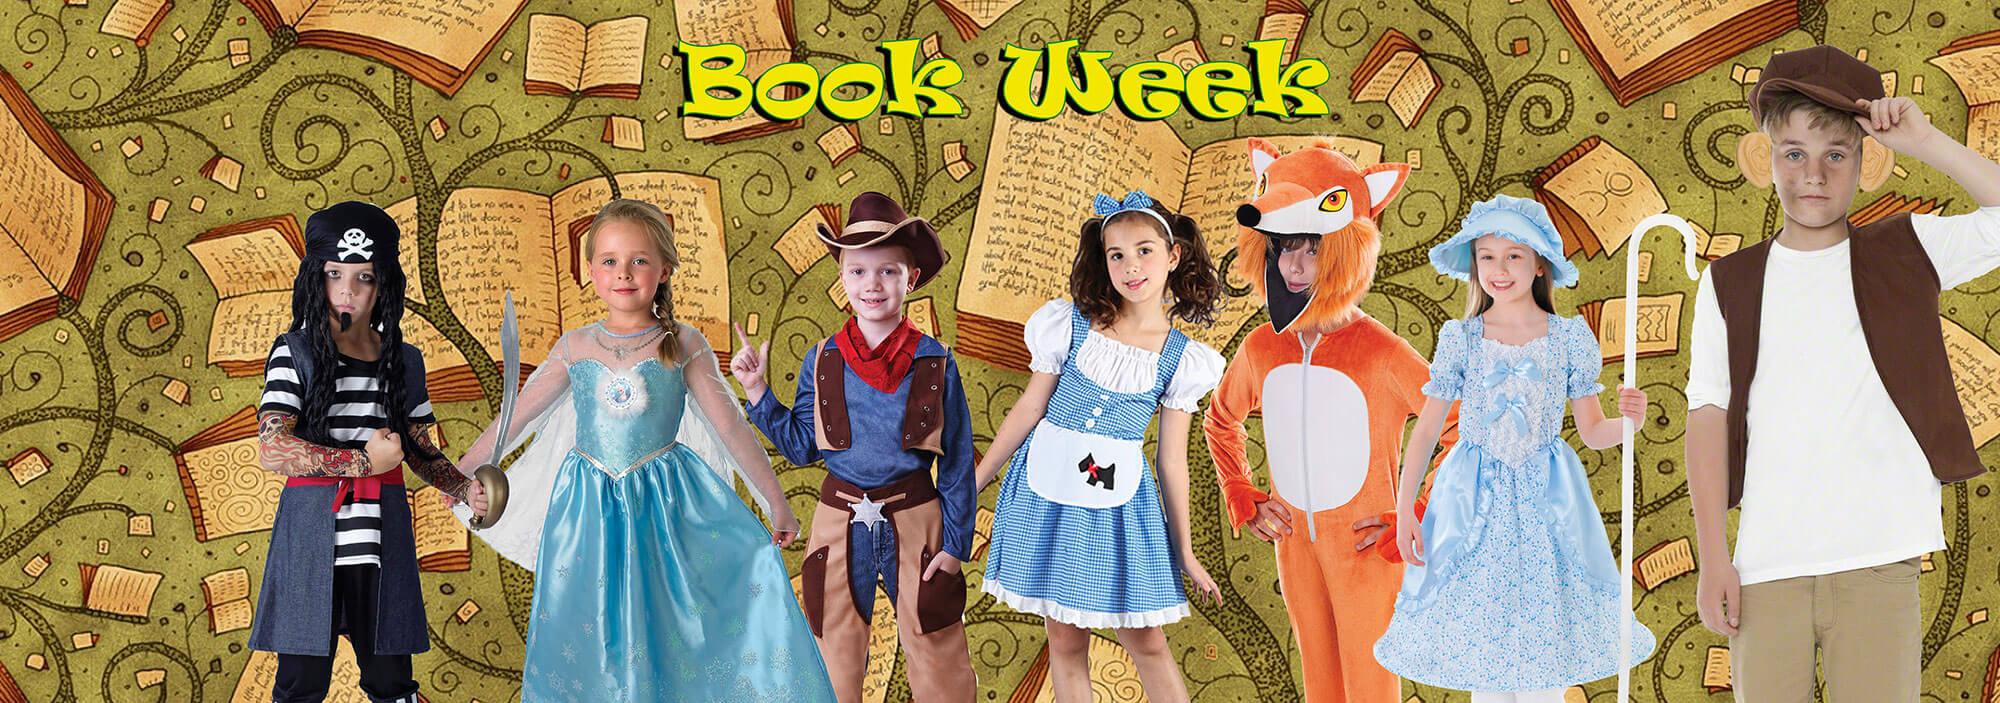 Childrens Bookweek Book Day Fancy Dress Ideas